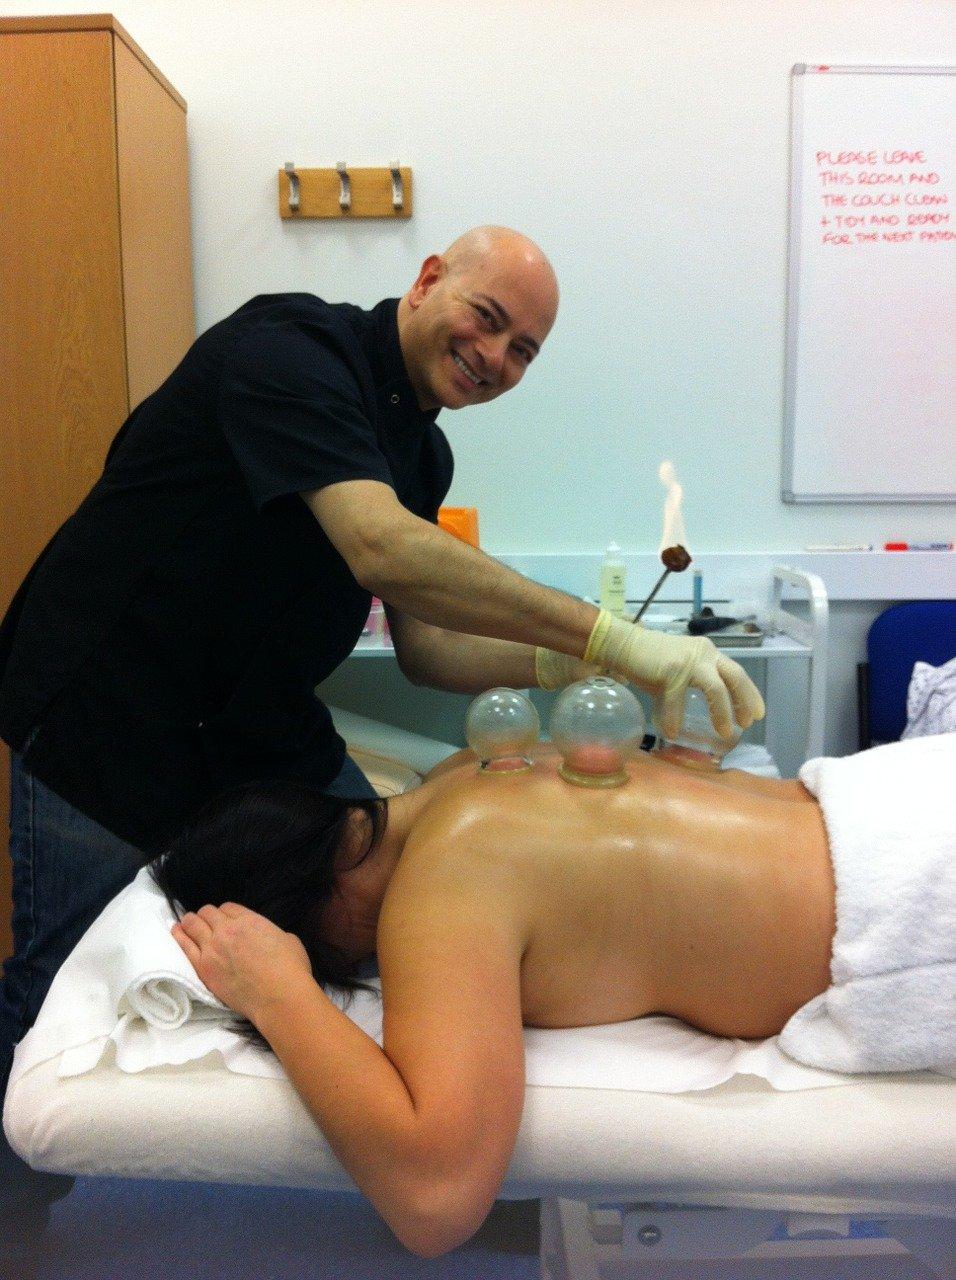 Fysio&Fit ter Waerden manueel therapeut